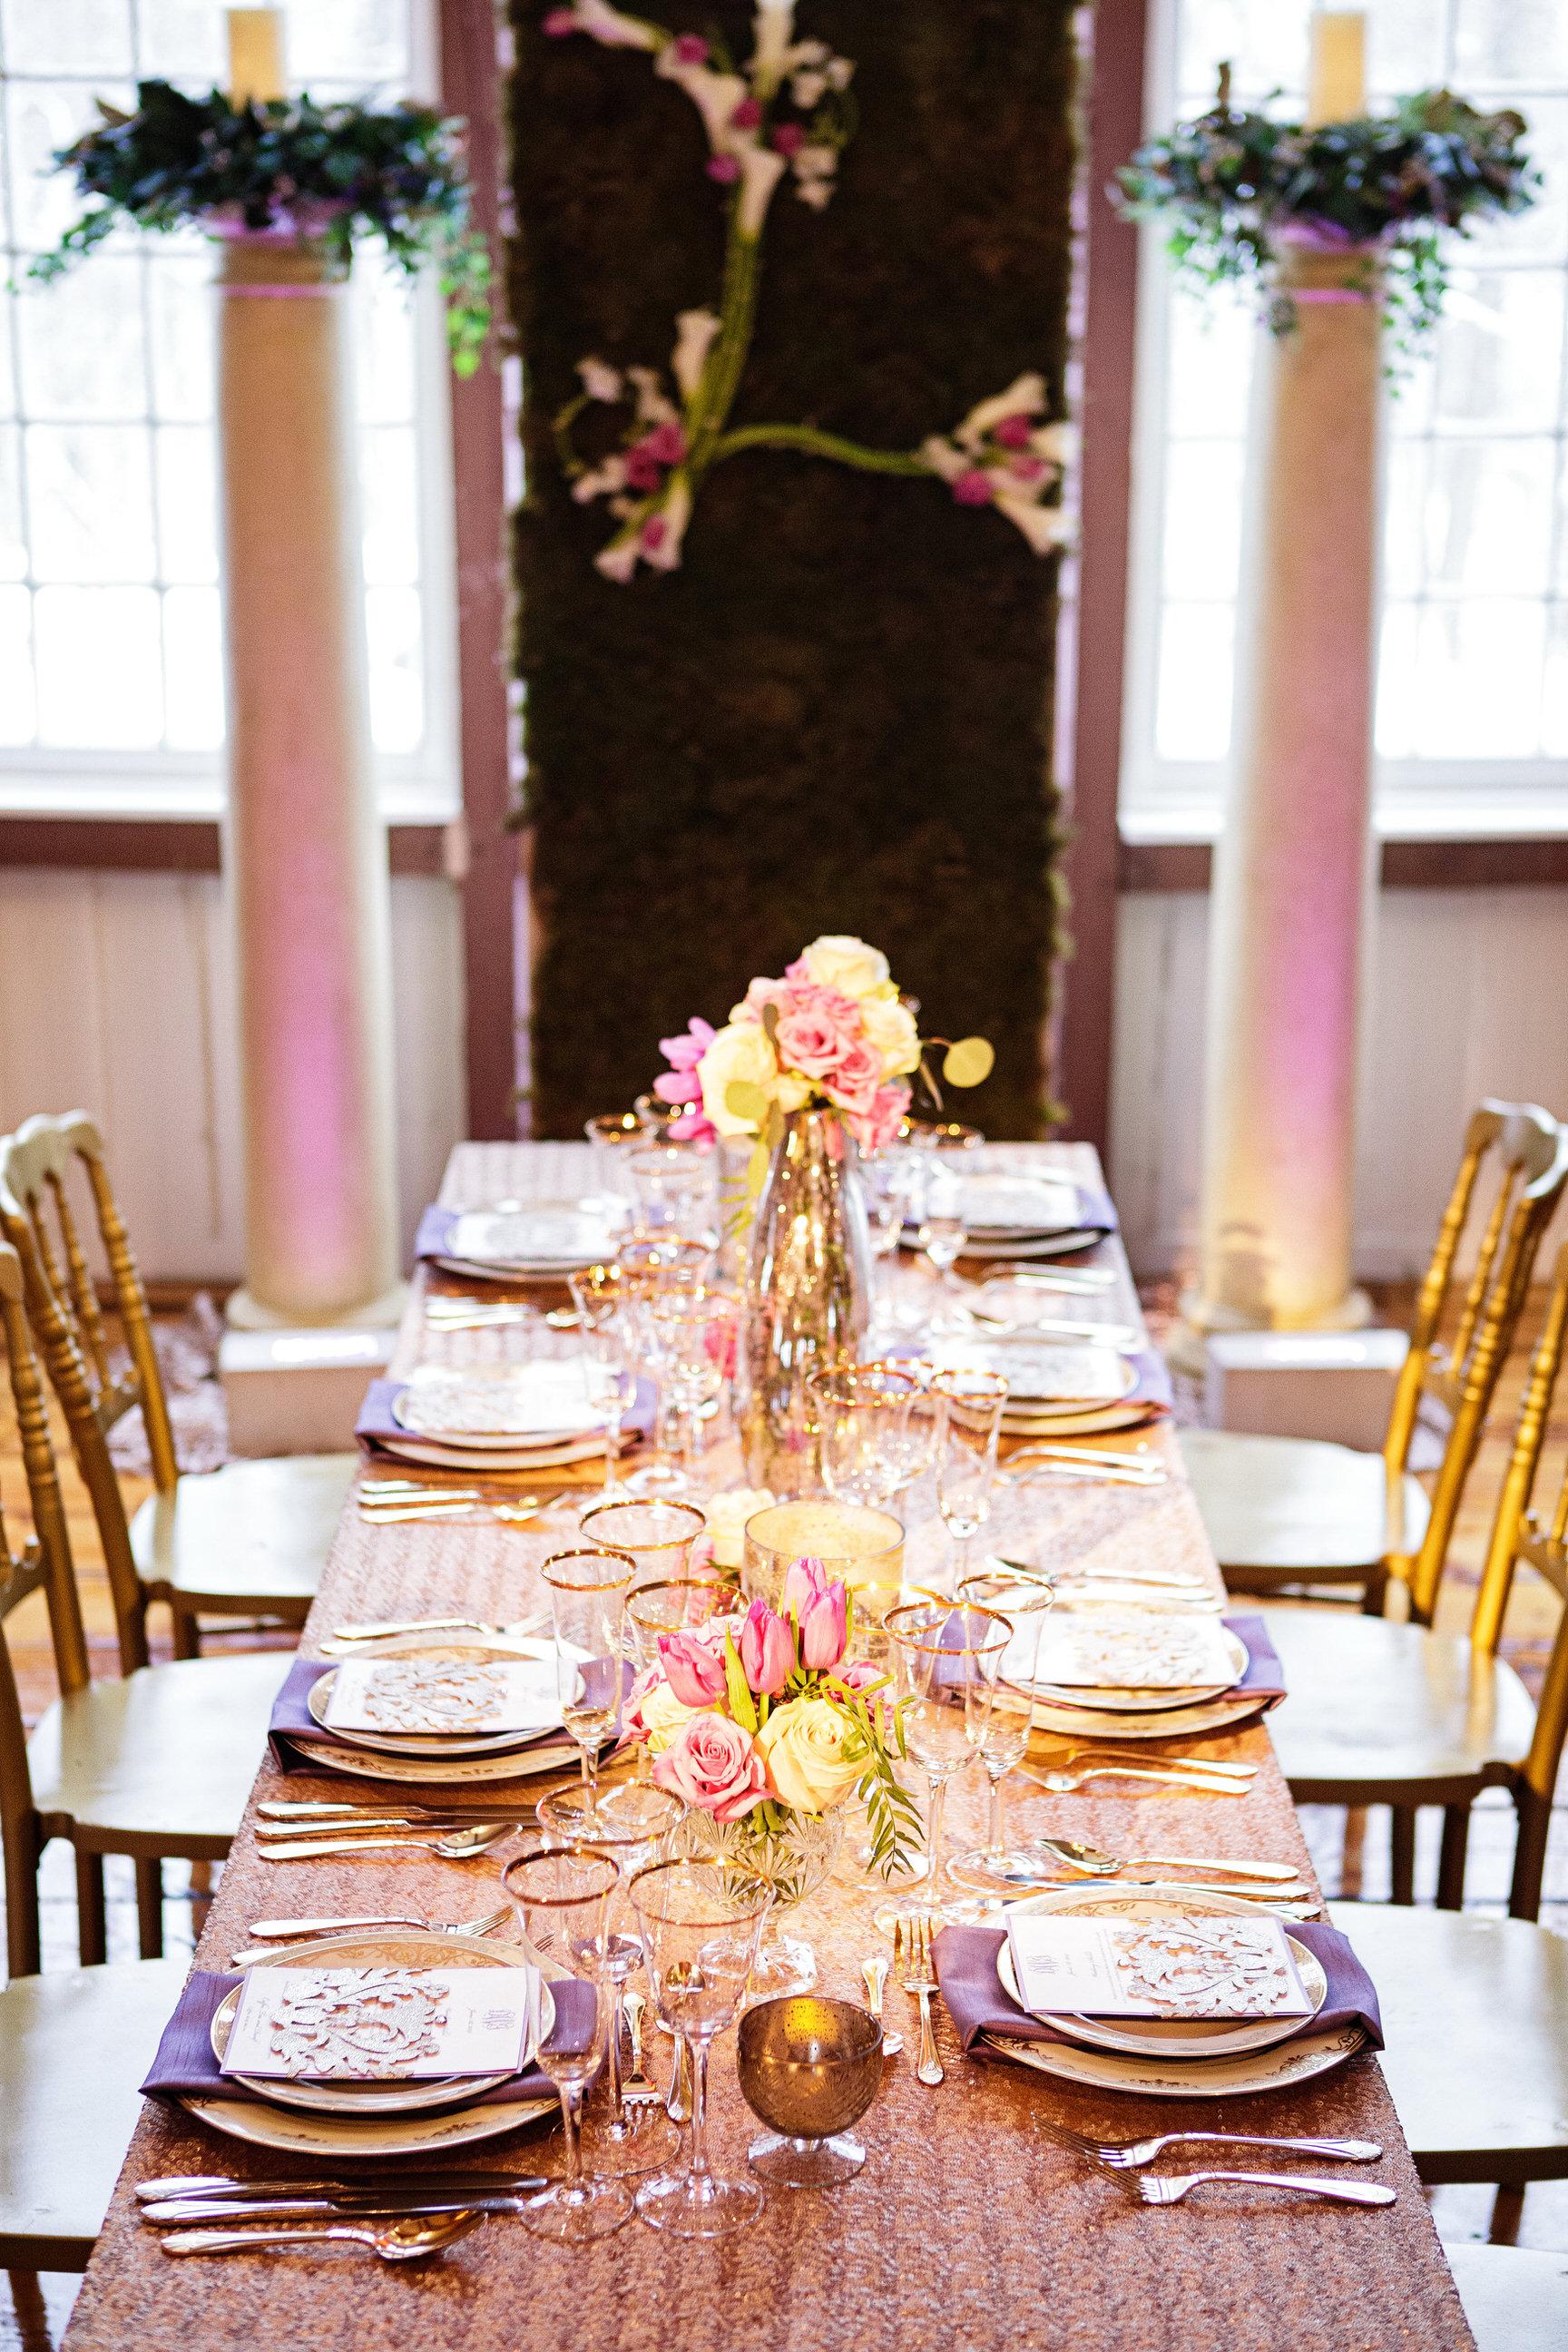 10 Philadelphia Wedding Gold Sequin Radiant Orchid Table Design.jpg